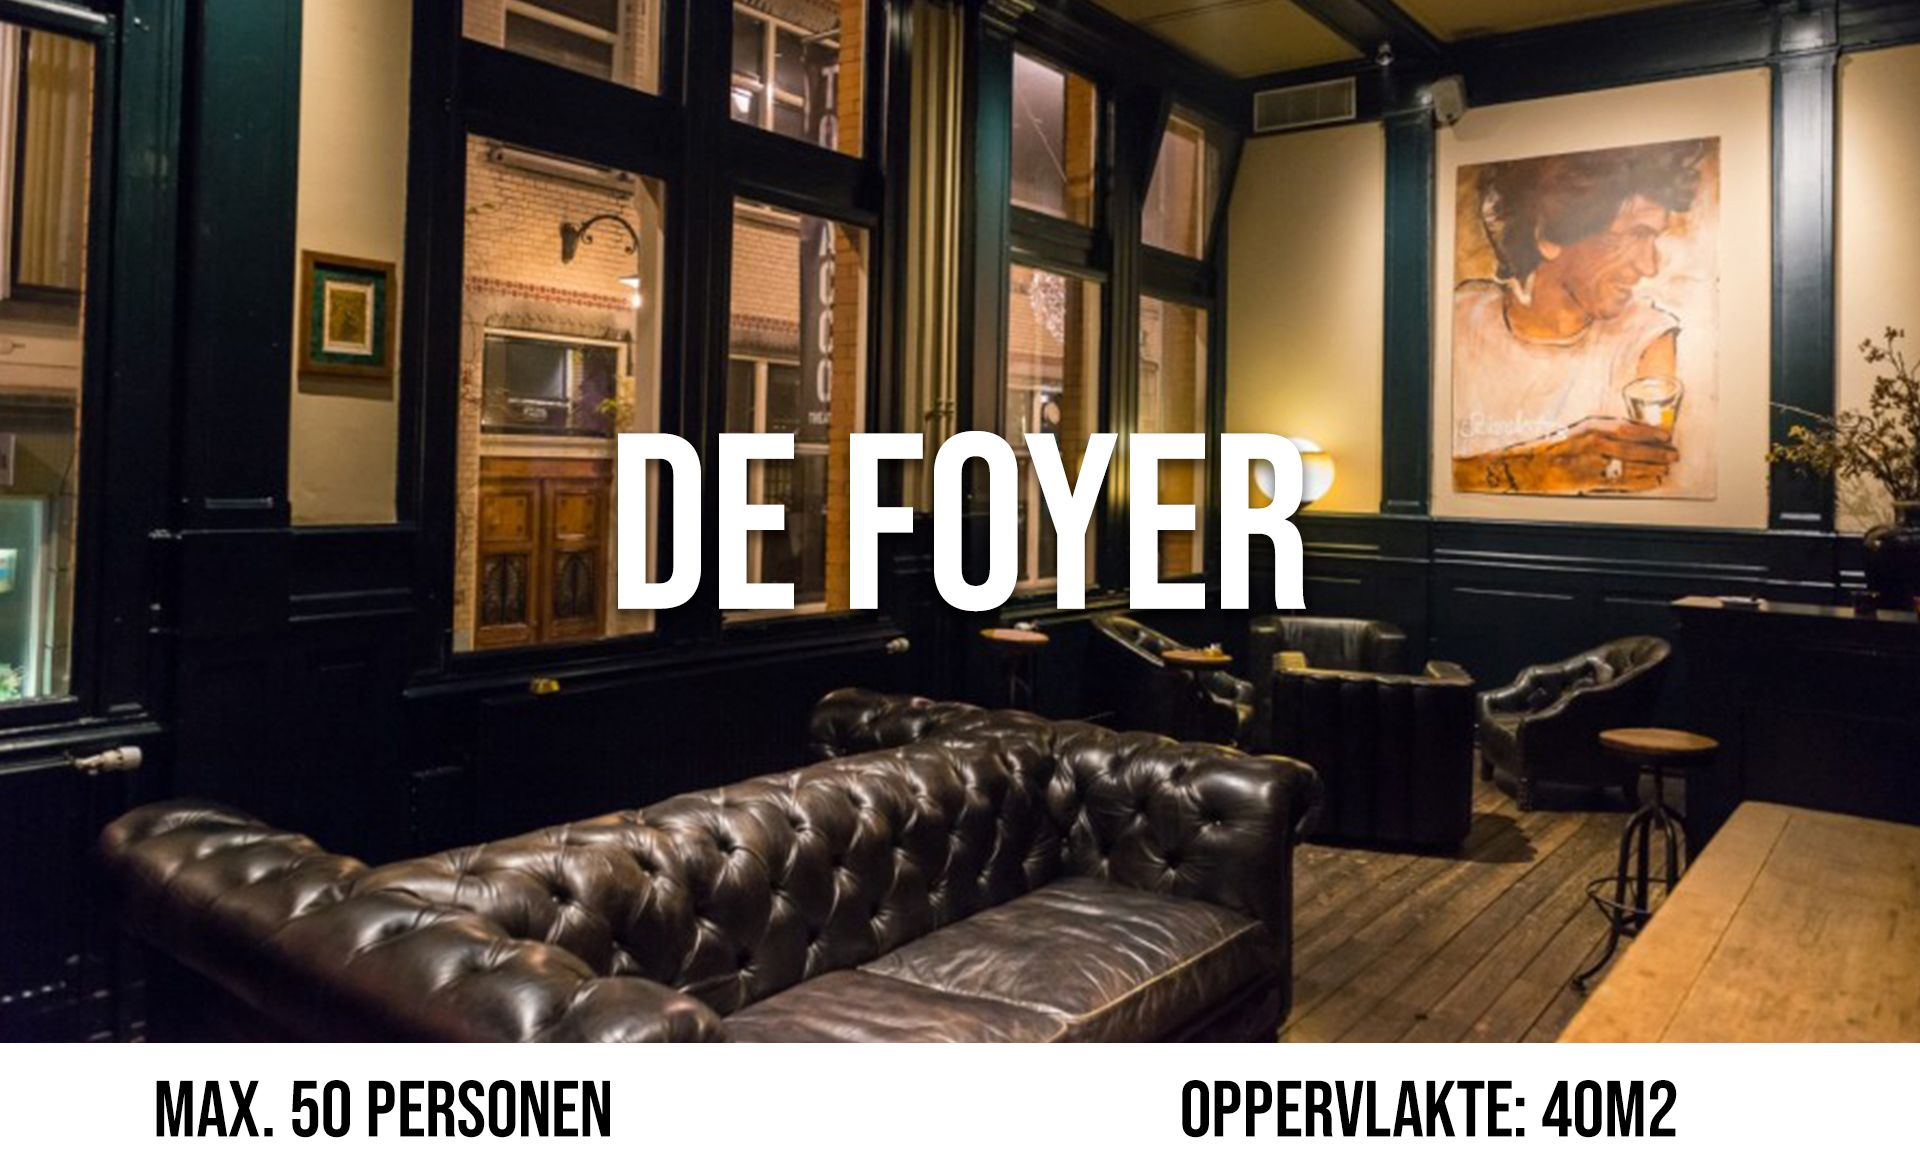 De Foyer (maximaal 50 personen, oppervlakte 40 m²)